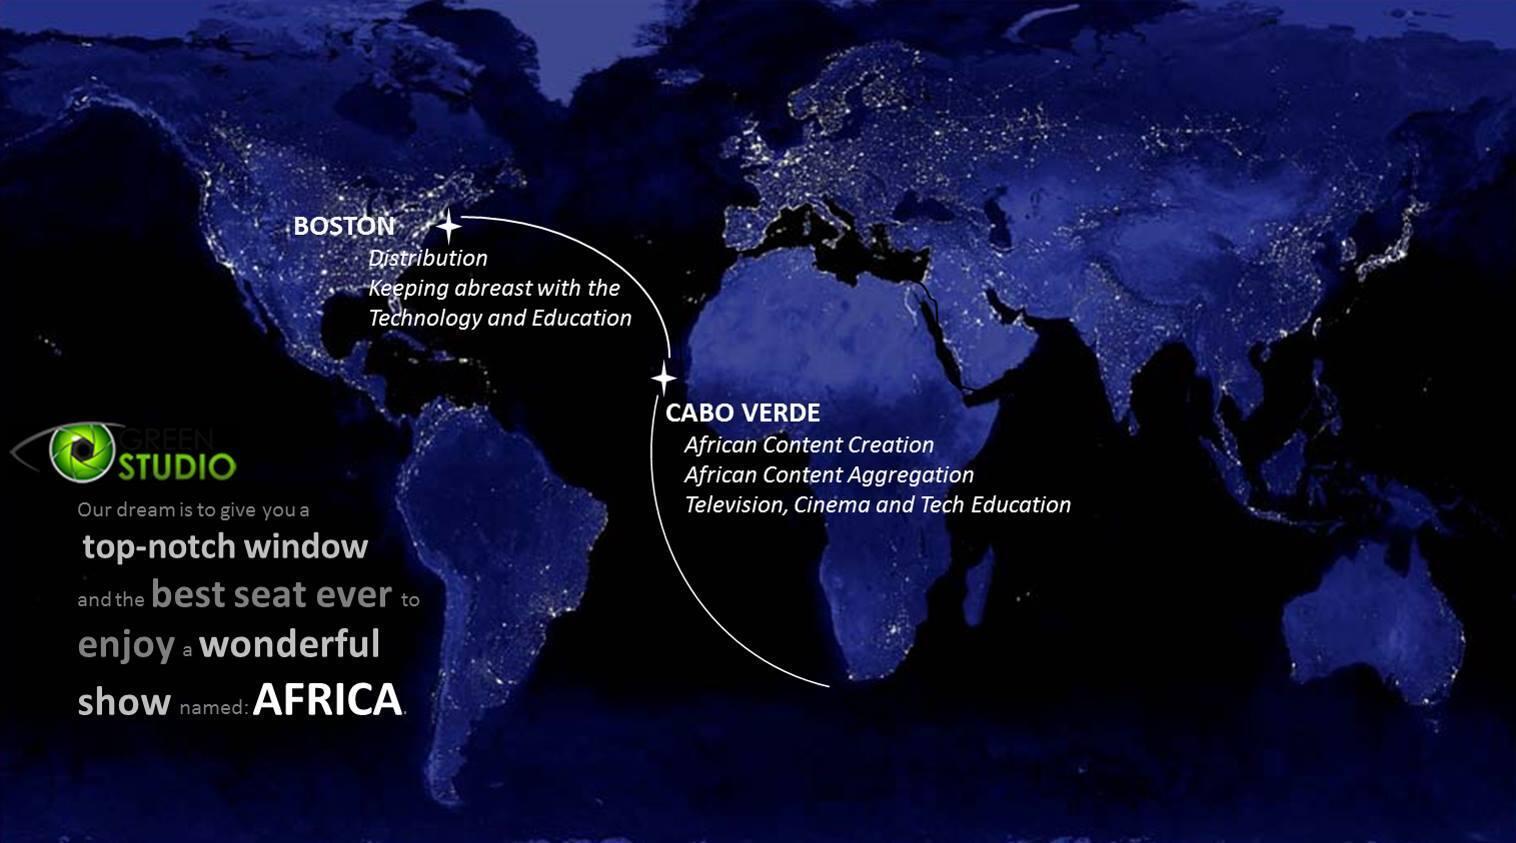 Captura do perfil da empresa caboverdiana Studio Green no Facebook